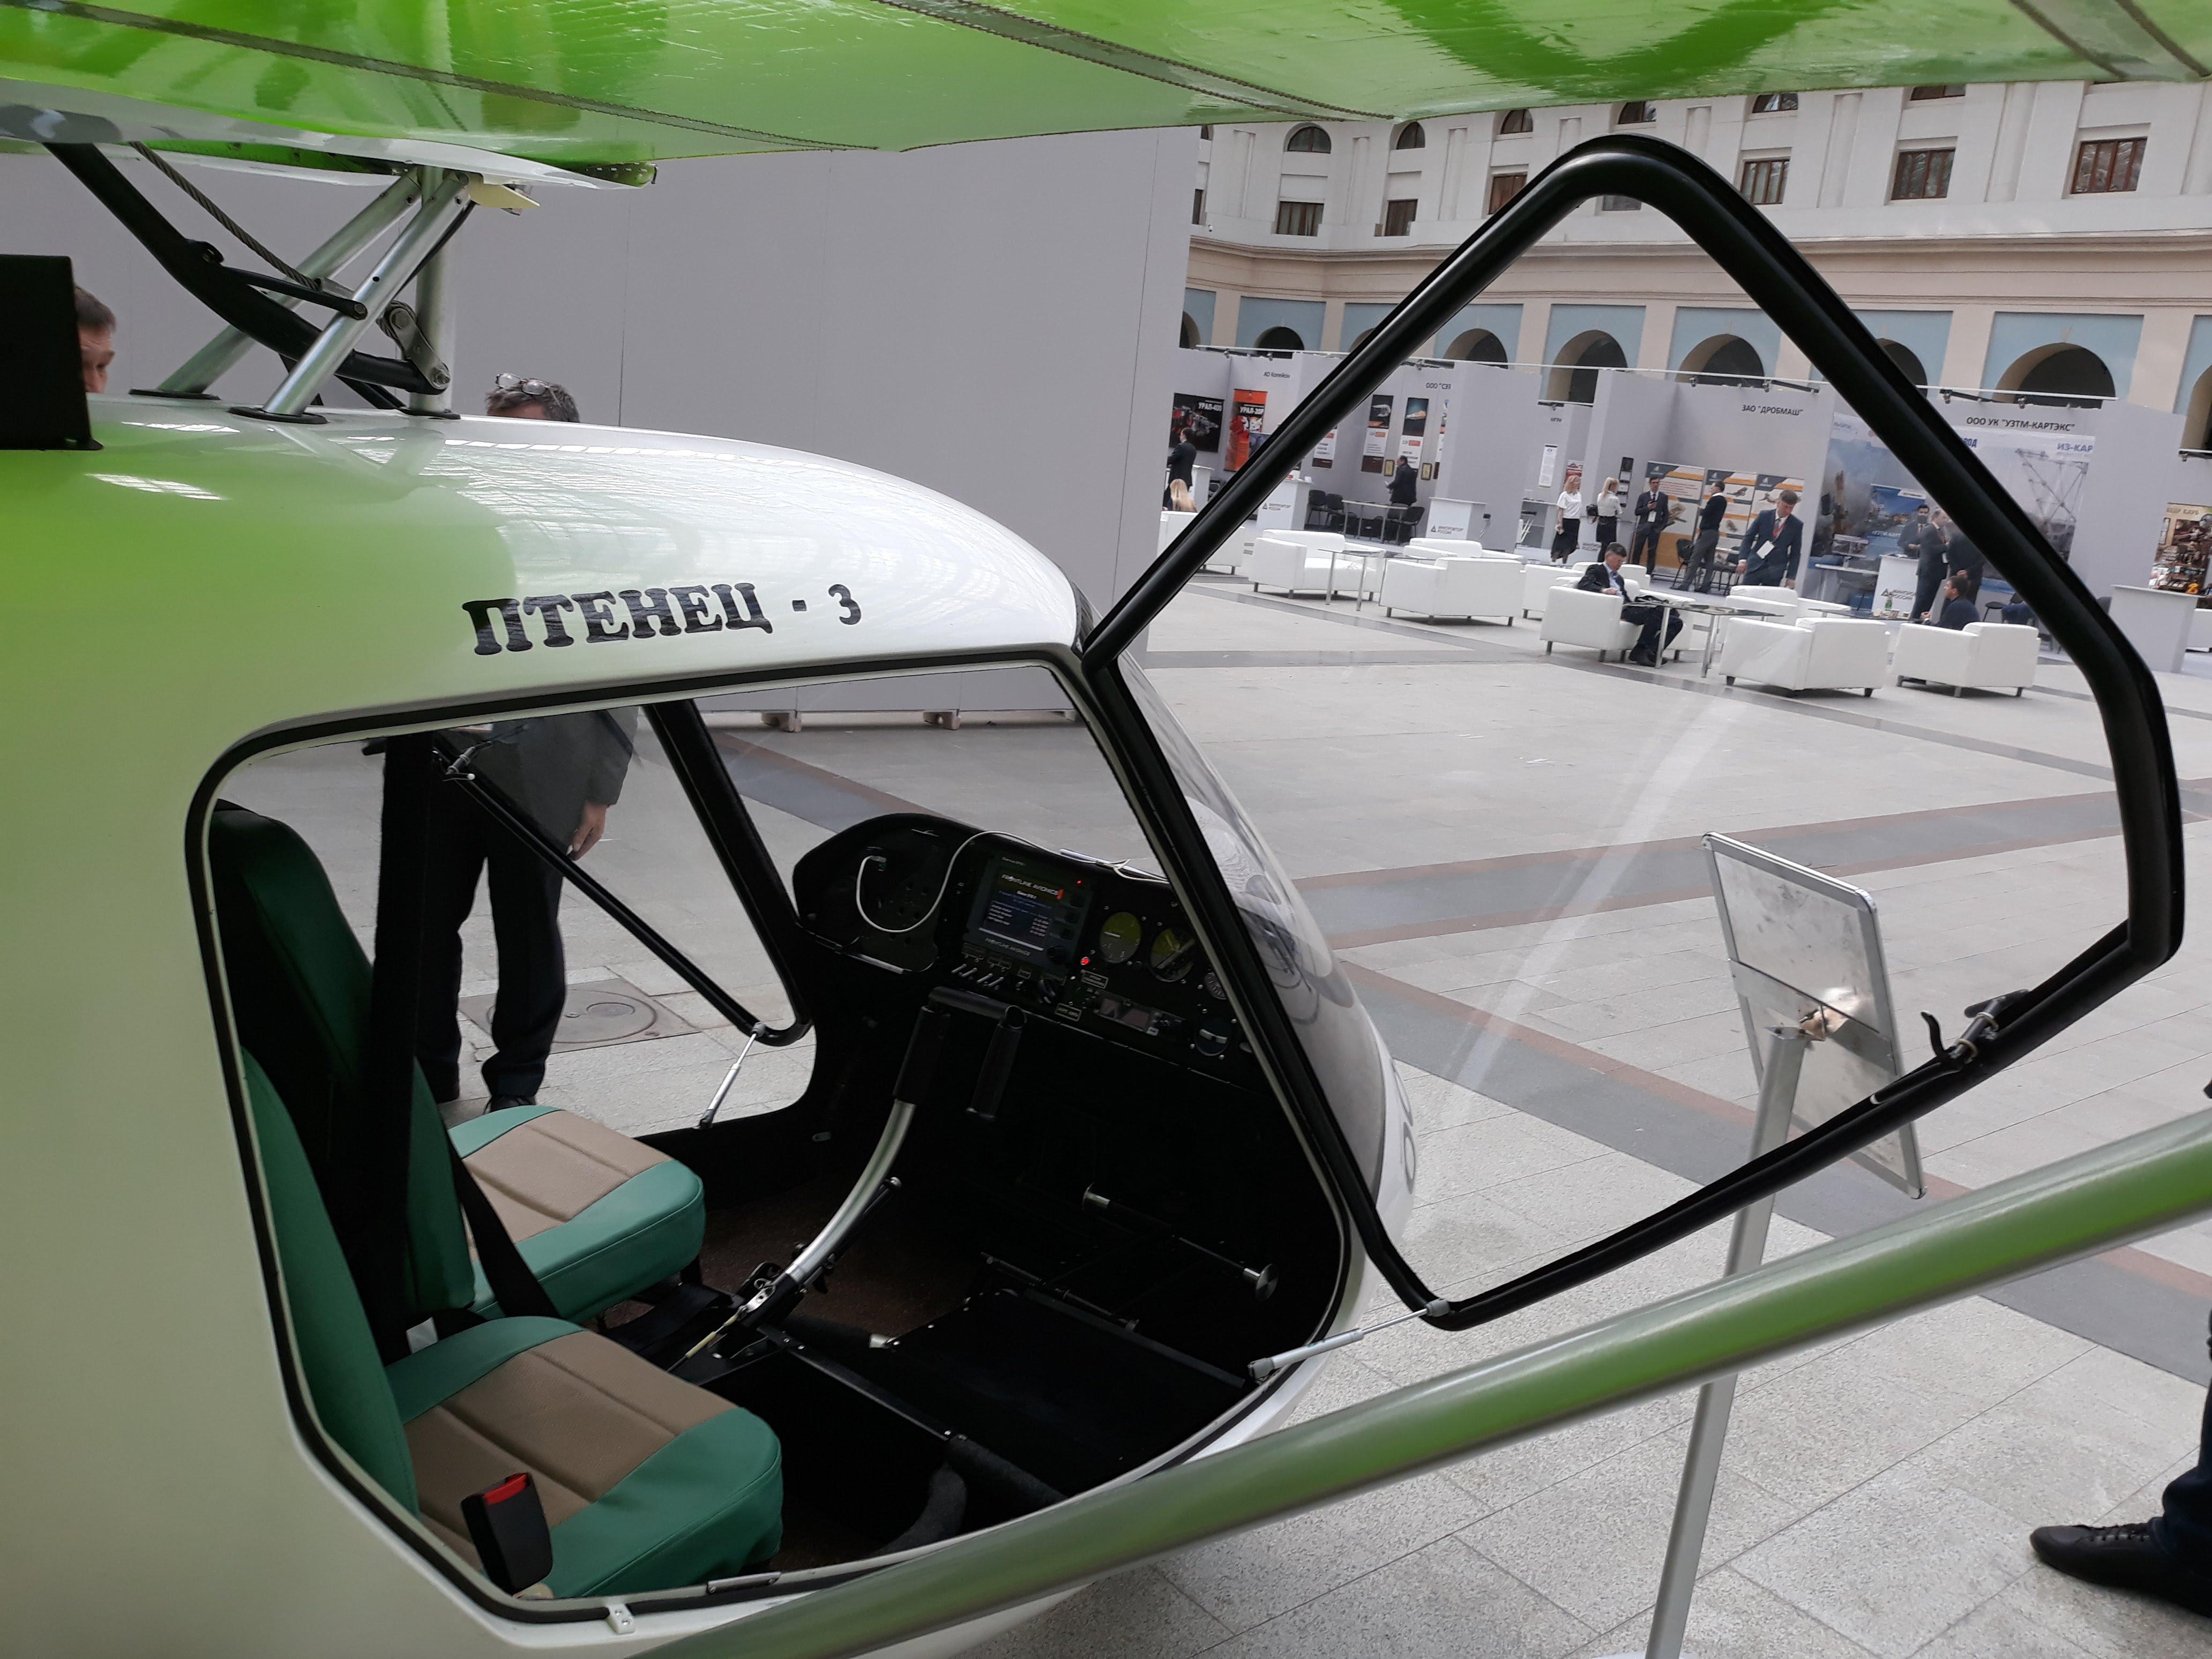 Самолет Птенец-3 салон